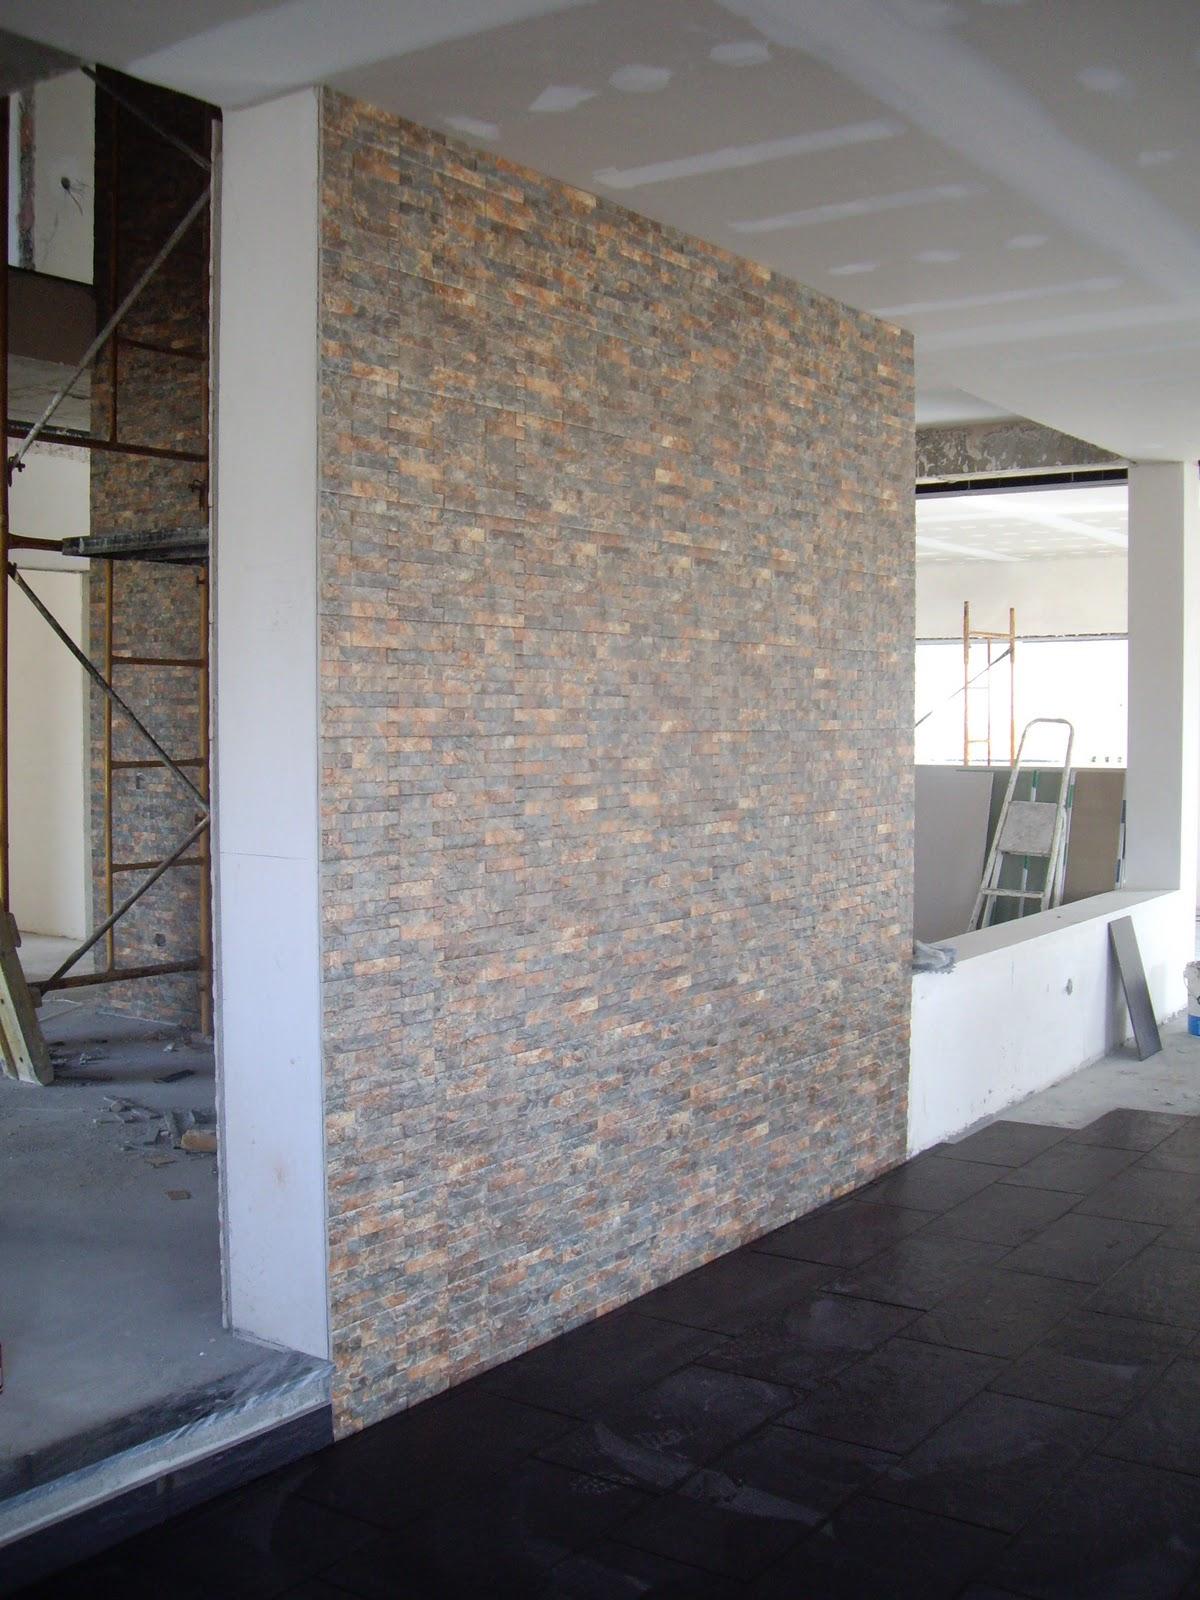 Mpr s ria d suc sso constru o remodela o e for Planchas para forrar paredes interiores